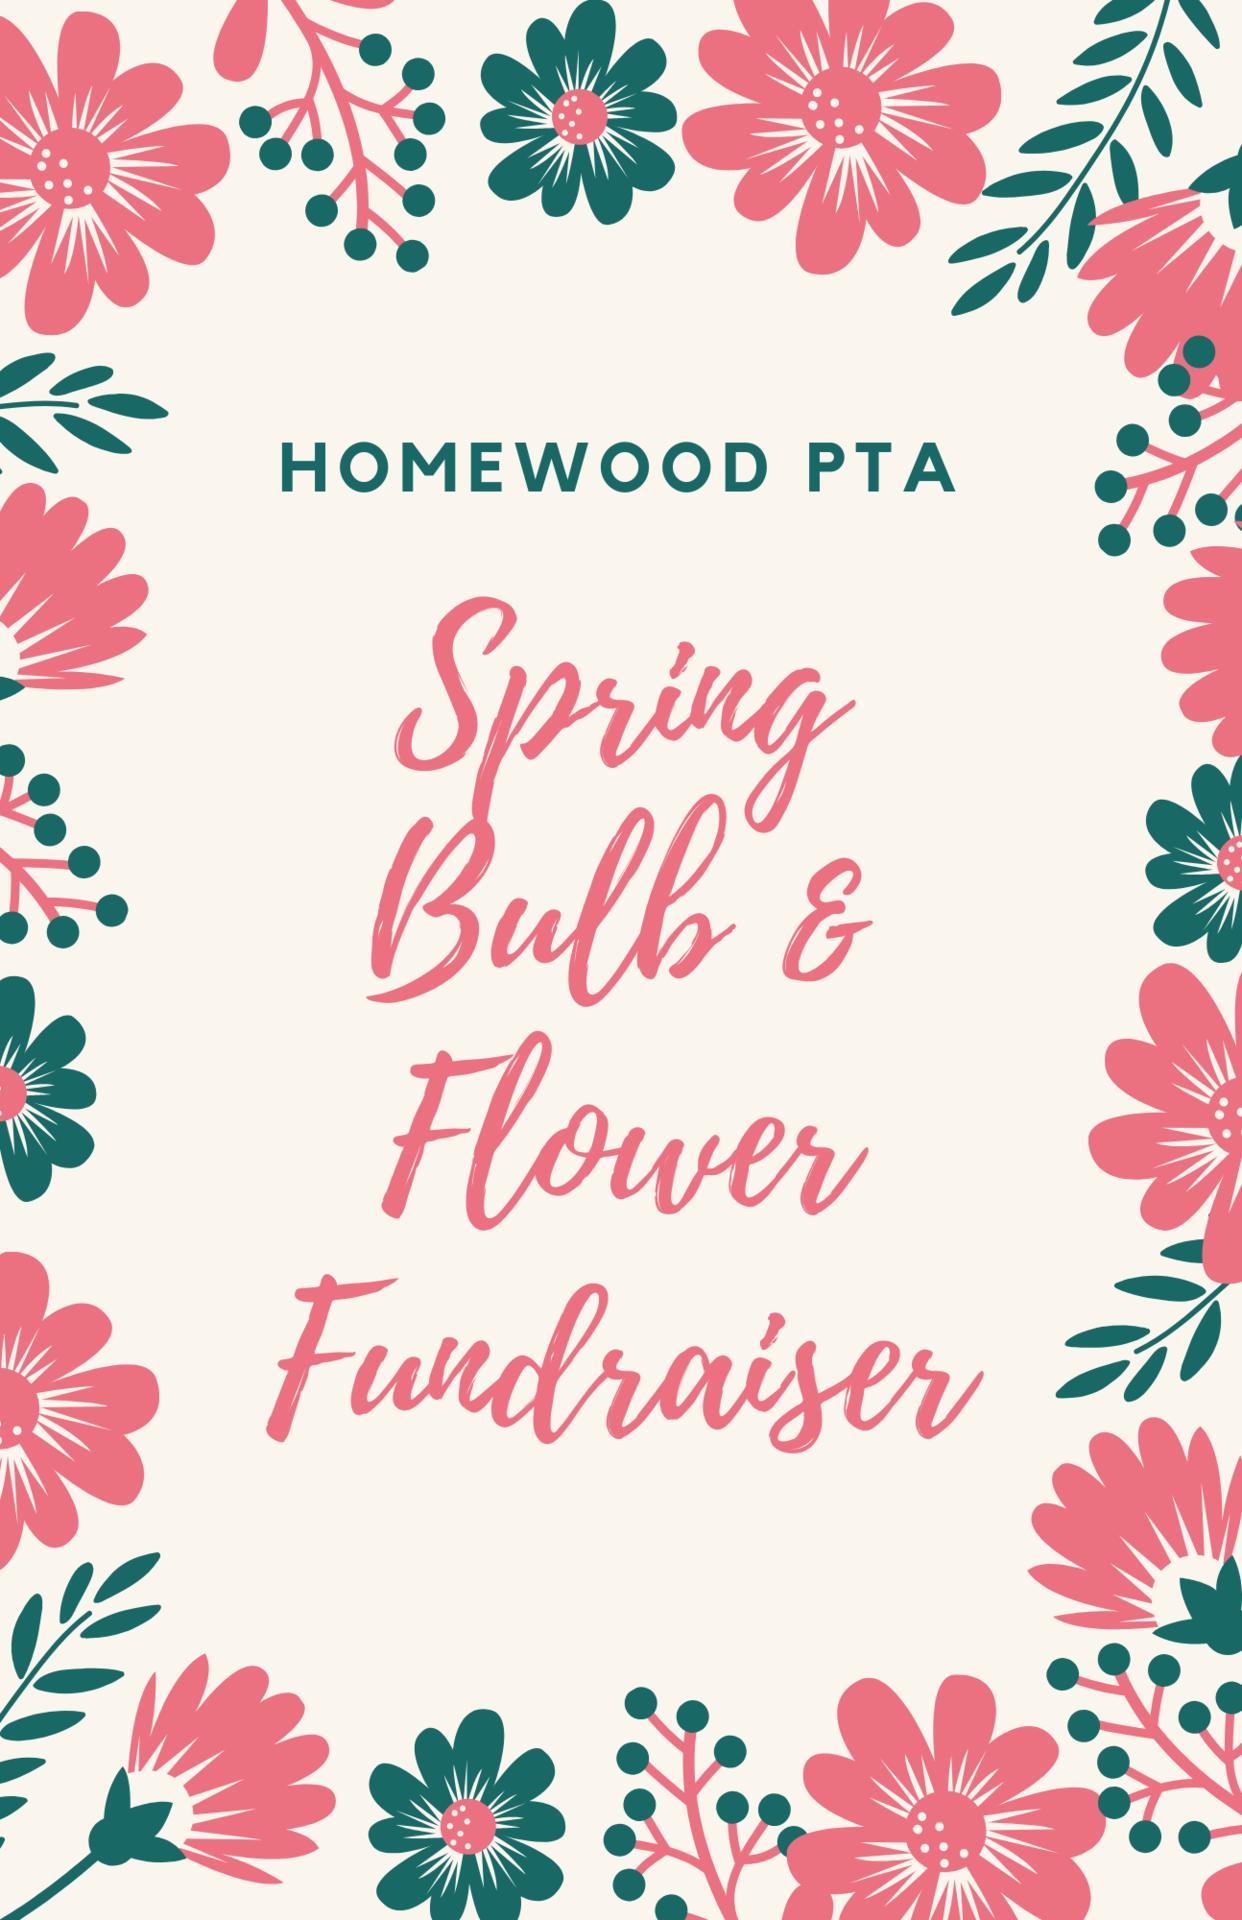 PTA Spring Bulb sale